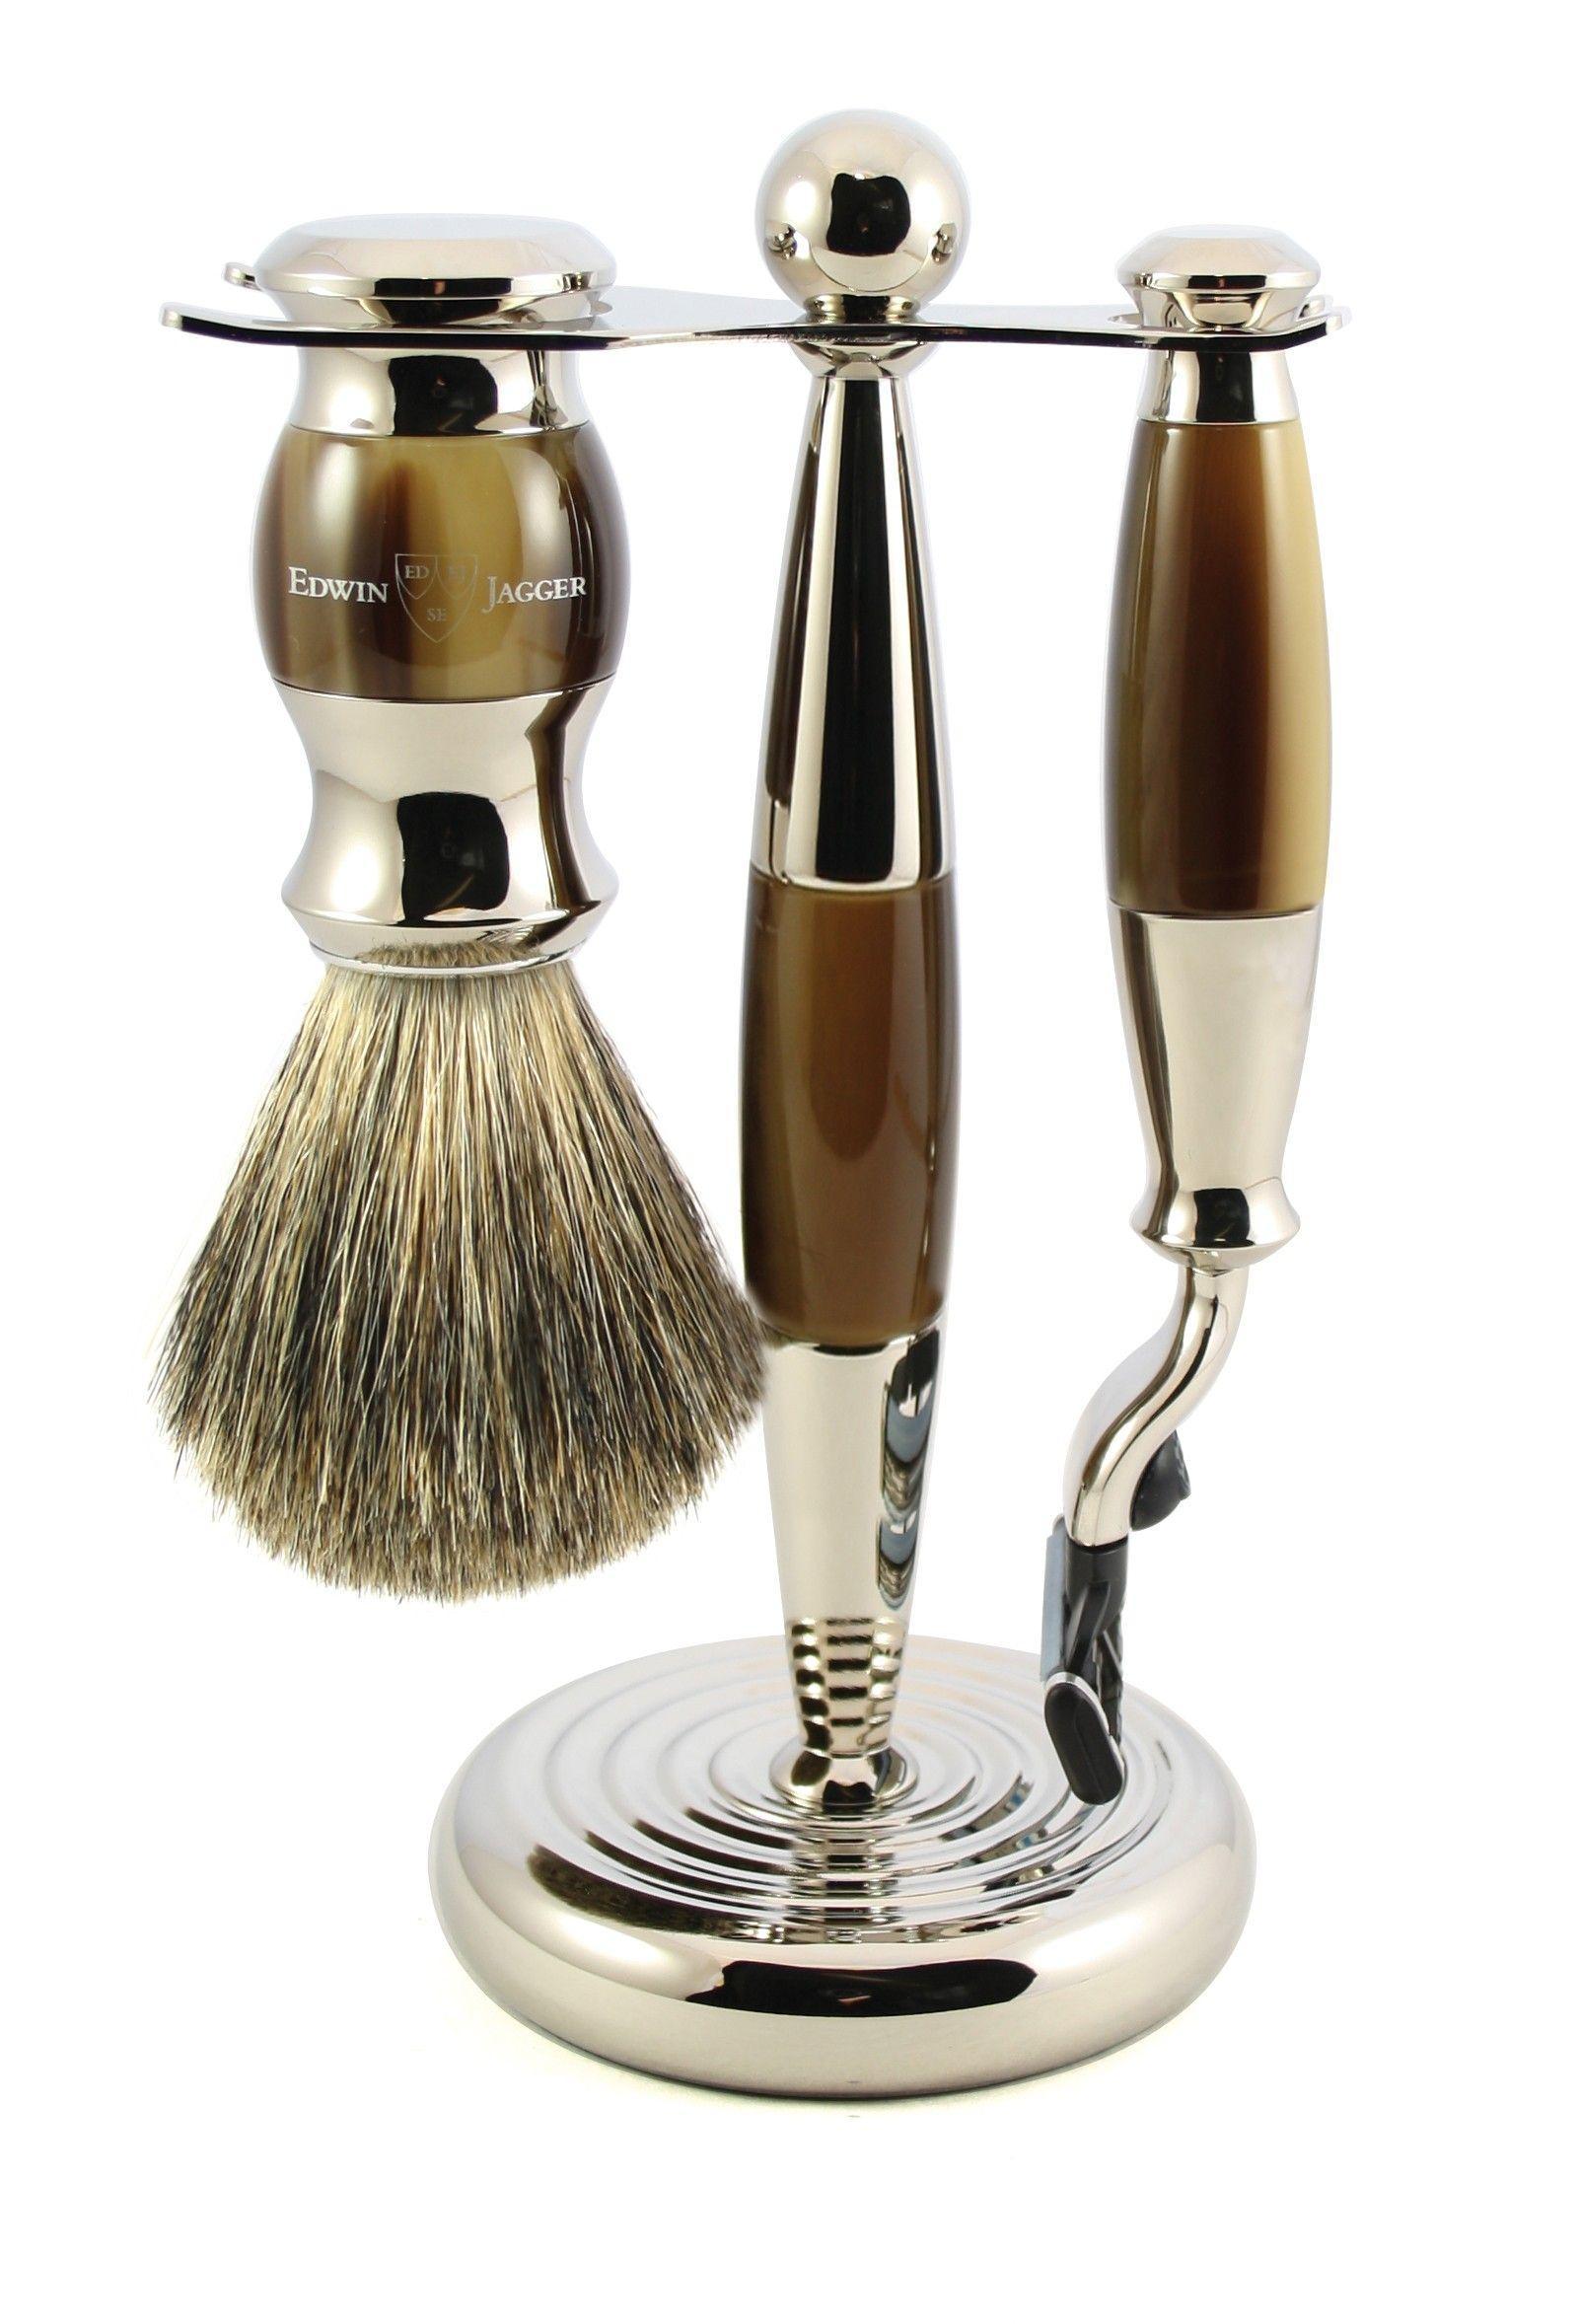 Horn 3 Piece Shaving Set Shaving set, Shaving, Edwin jagger